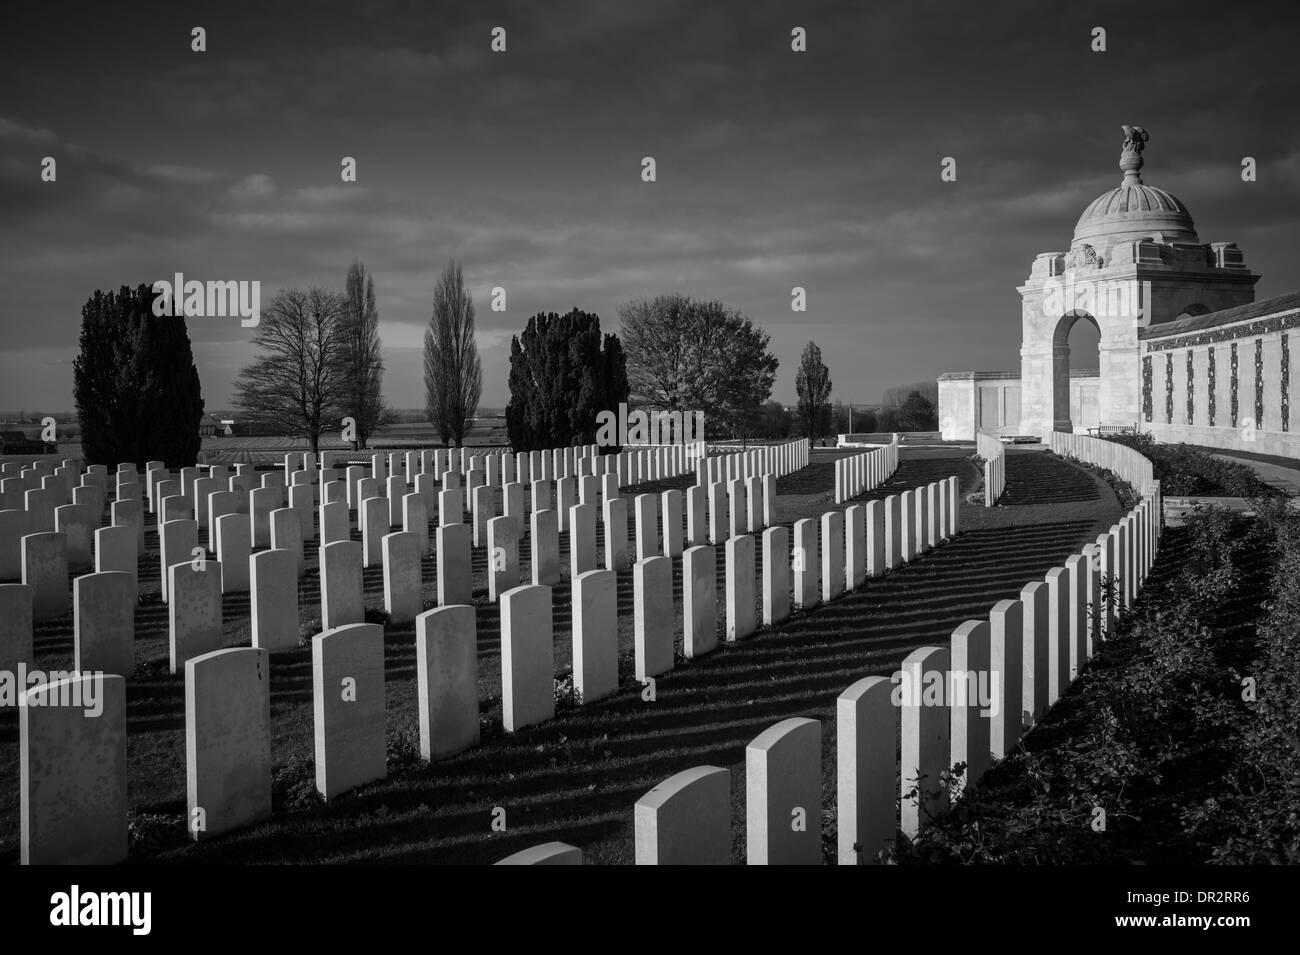 Tyne Cot Commonwealth War Graves Cemetery, Belgium - Stock Image